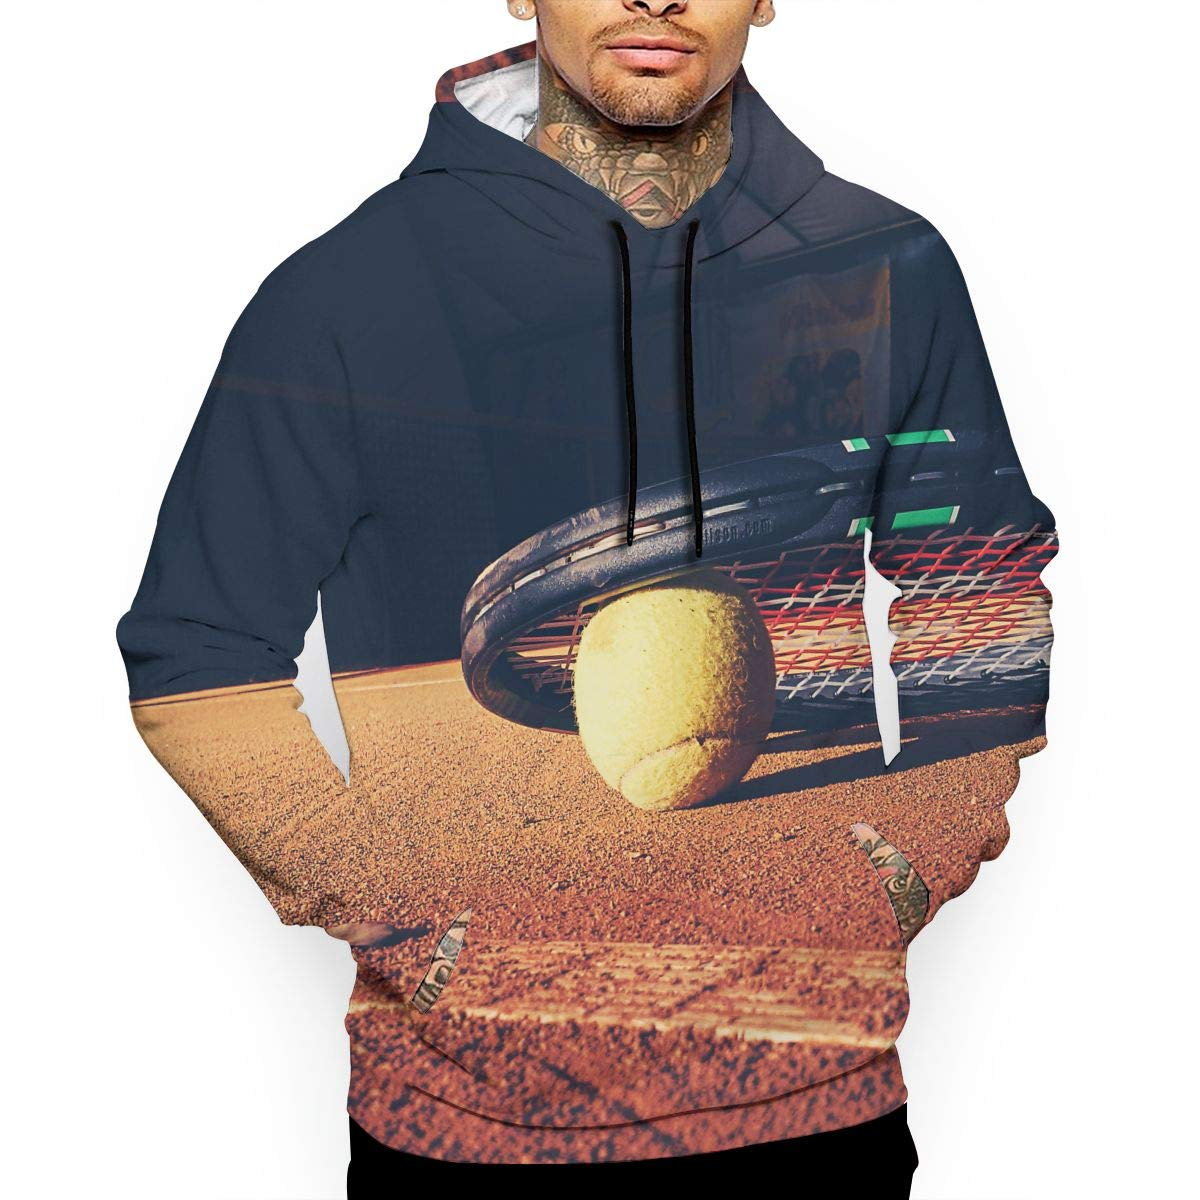 Pullover Hoodie Tennis Racket Court Fleece Hoodies Kangaroo Pocket Sweatshirt Hooded for Men